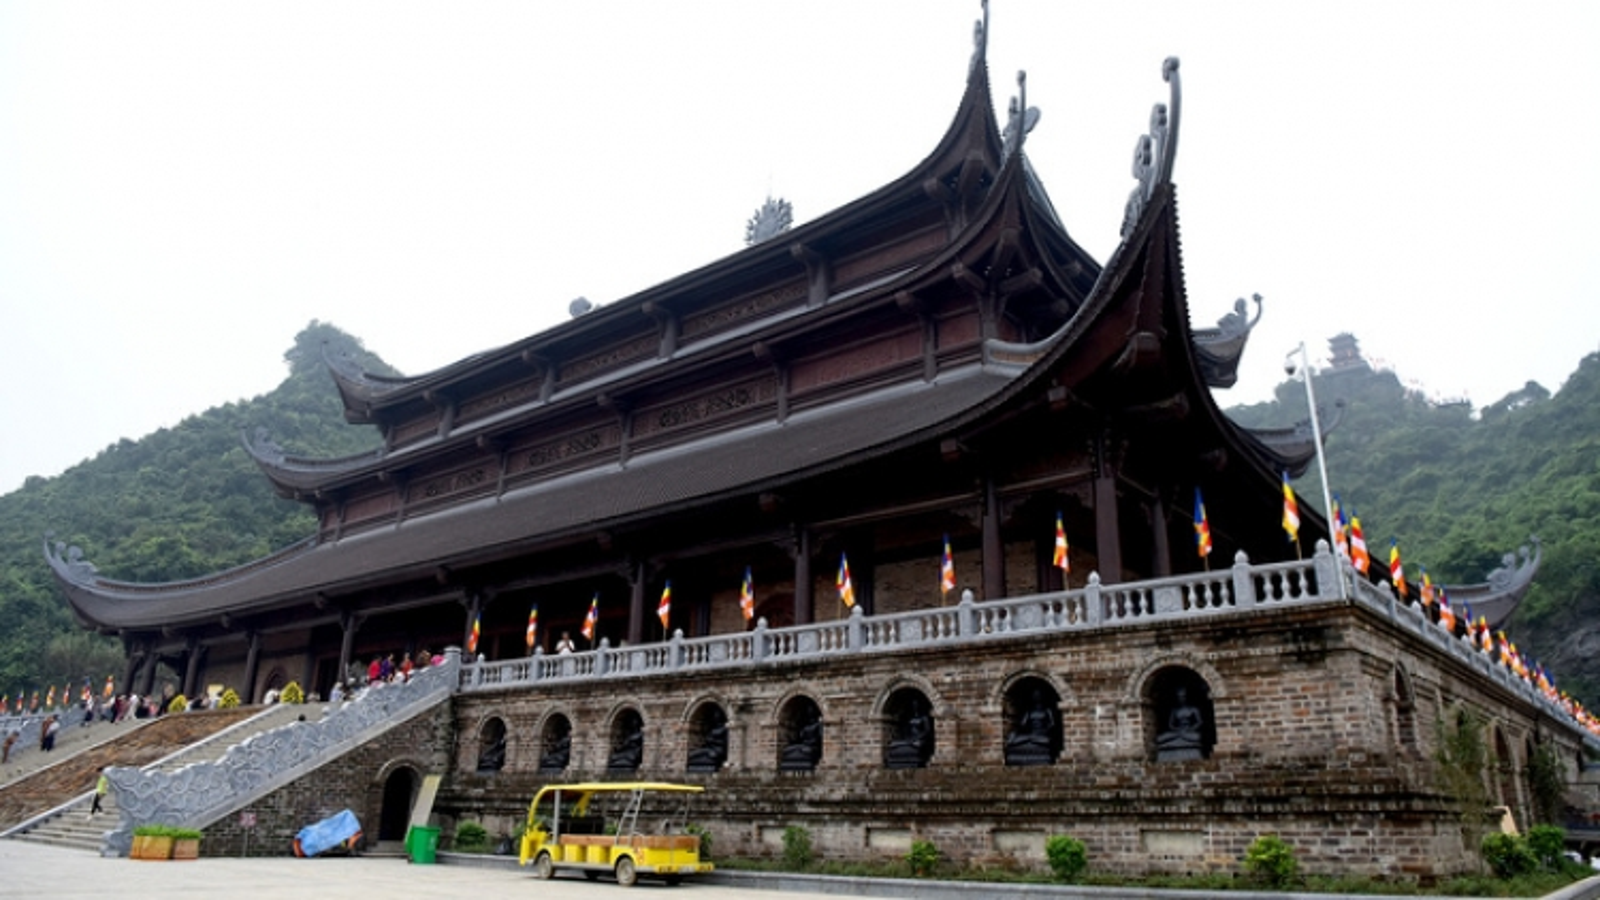 Tam Chuc pagoda gears up for UN Day of Vesak